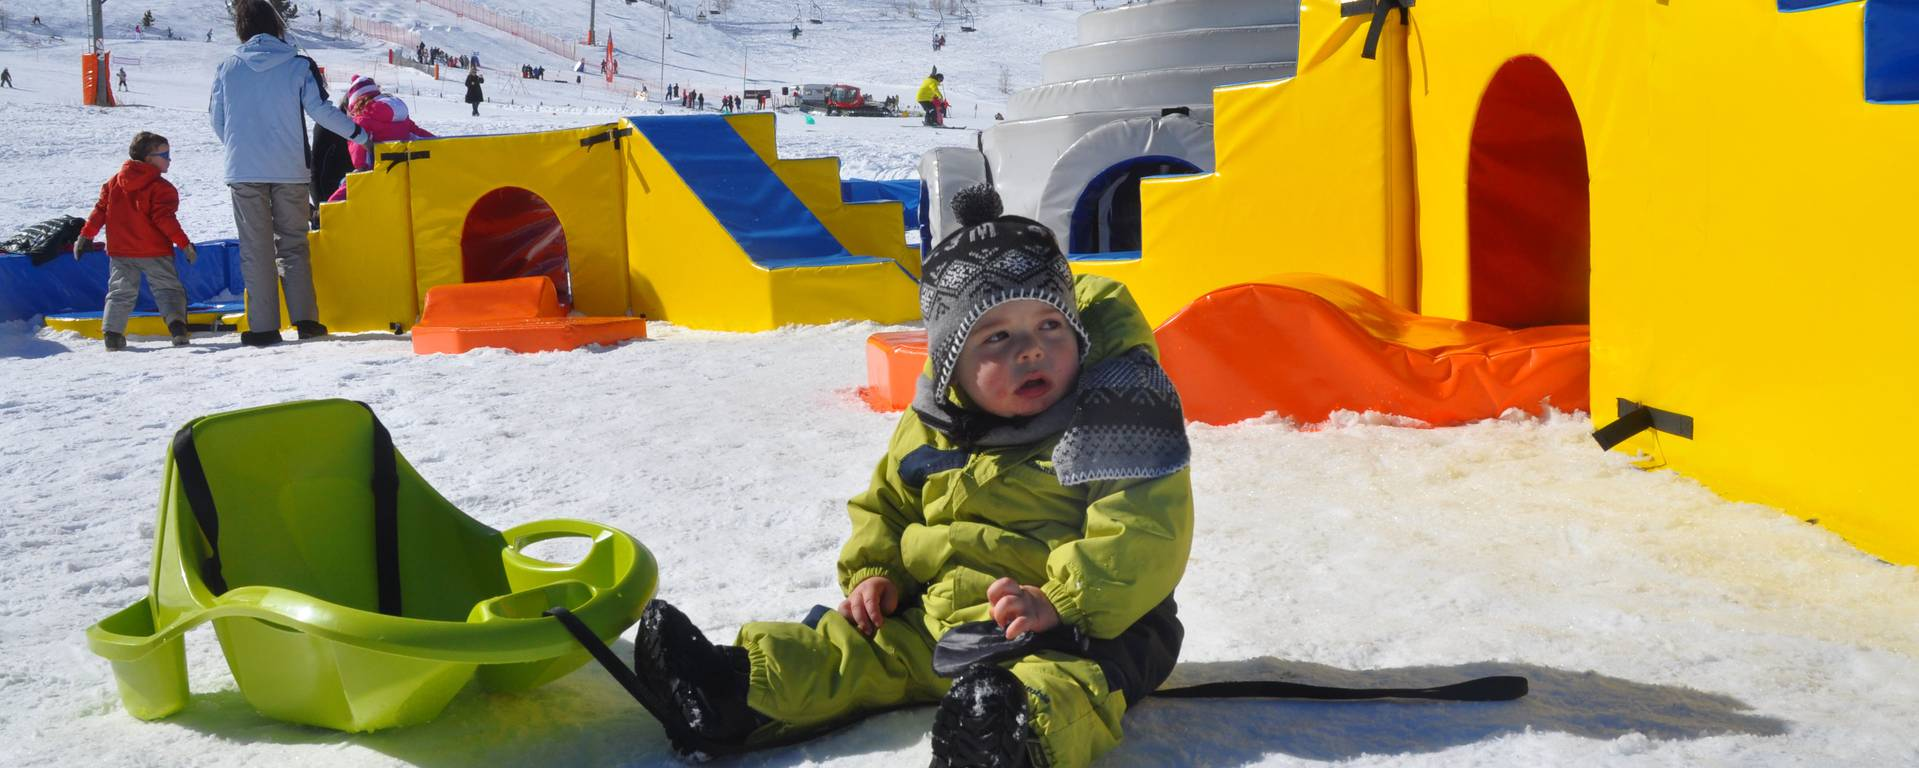 L'espace enfant igloo de porty  ©Fredérique BERLIC